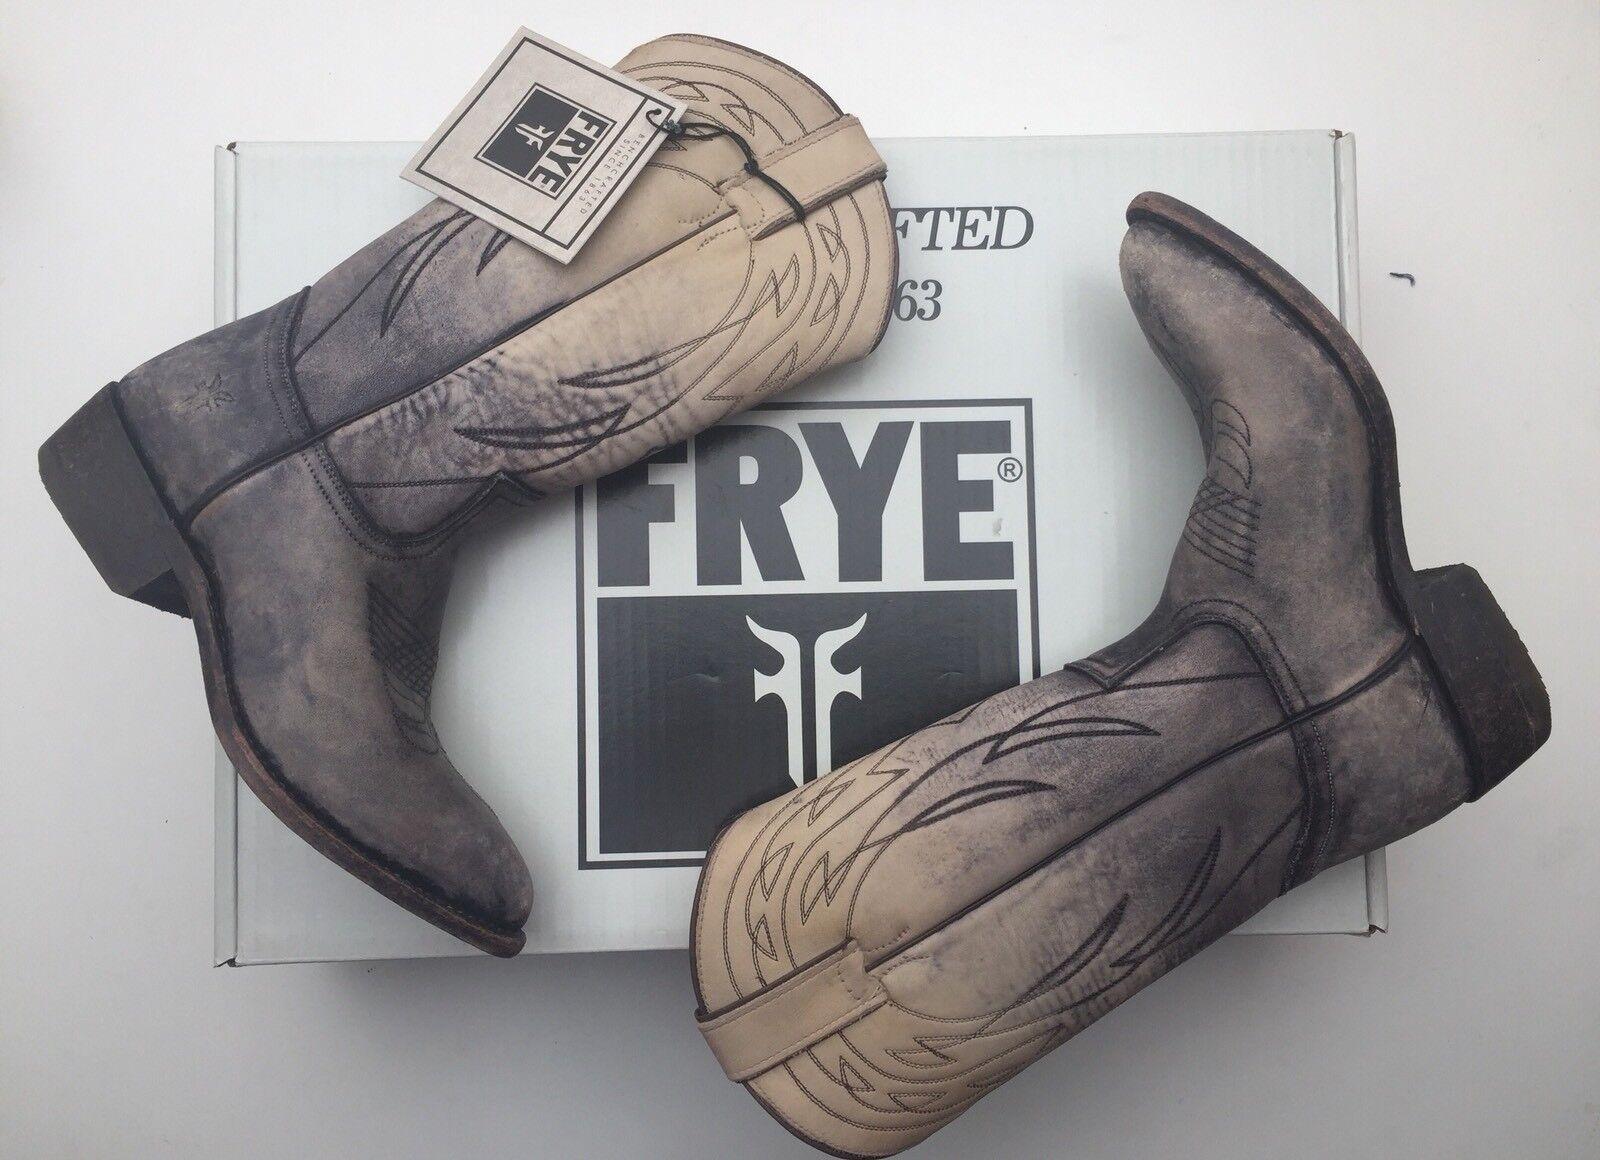 Grandes zapatos con descuento BNIB Authentic FRYE BILLY PULL ON Cowboy Boots Stone 77713 5 Guaranteed Original